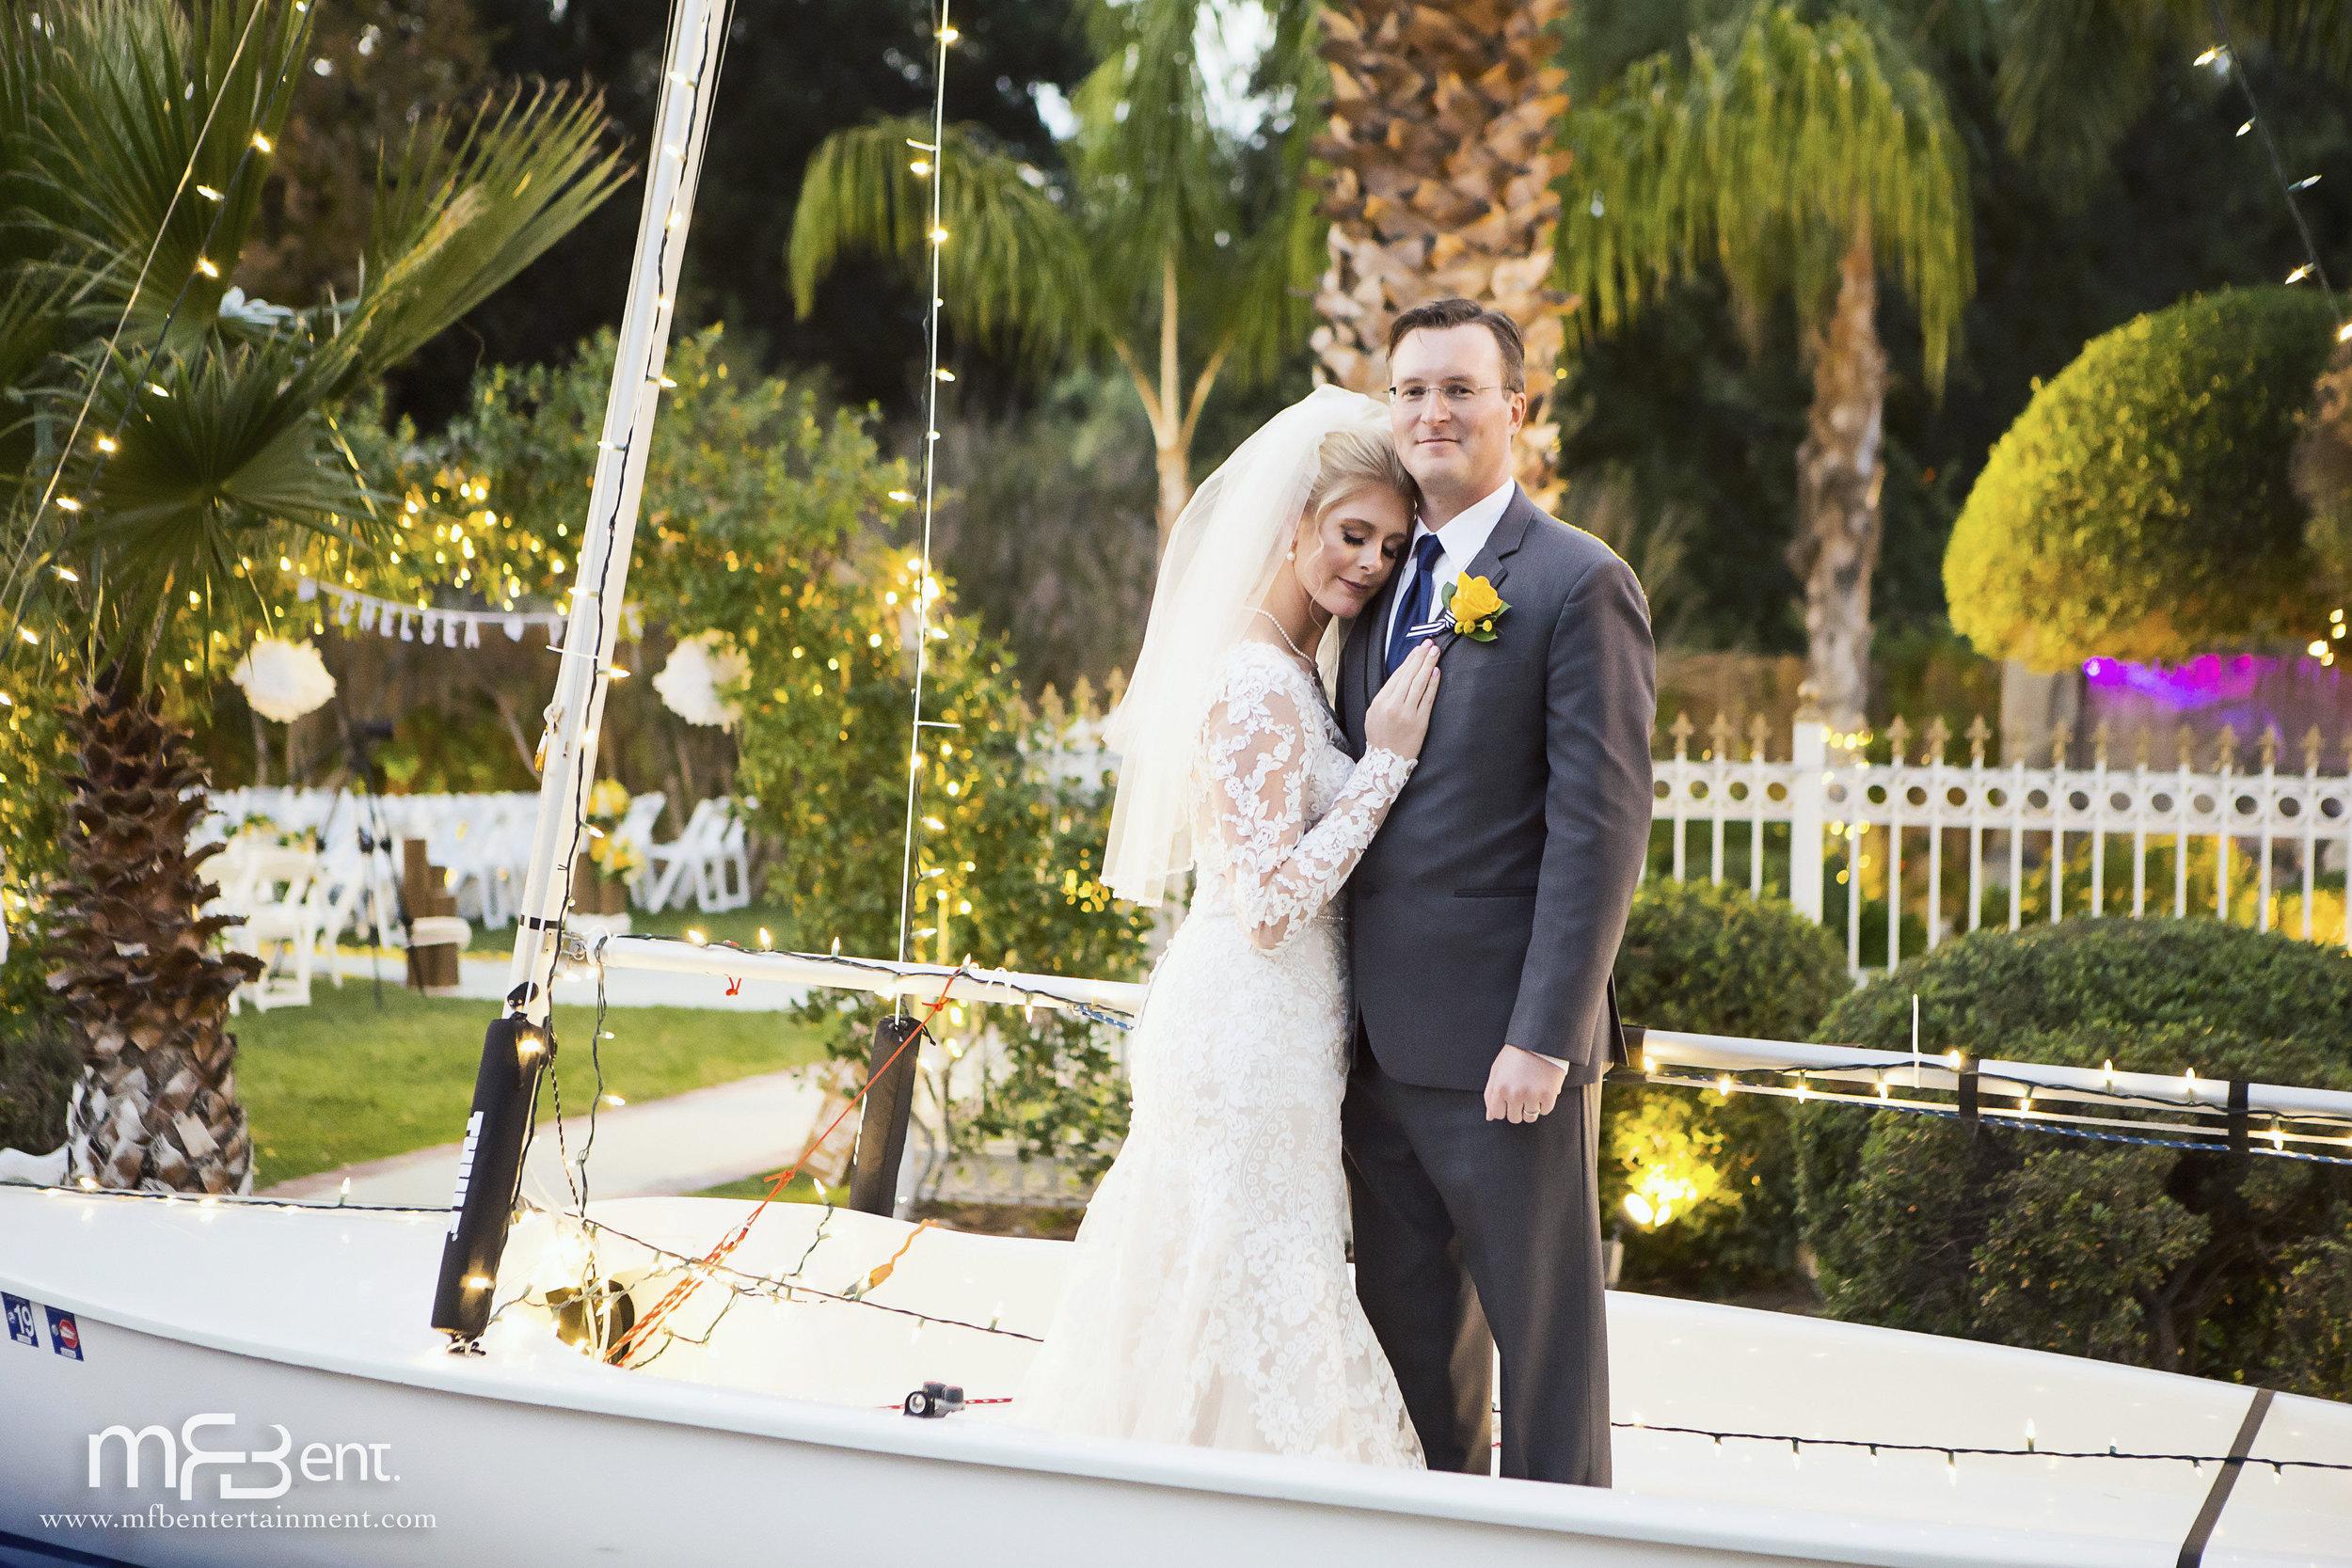 PIOTR CHELSEA WEDDING-PHOTO SESSION-0056 L.jpg